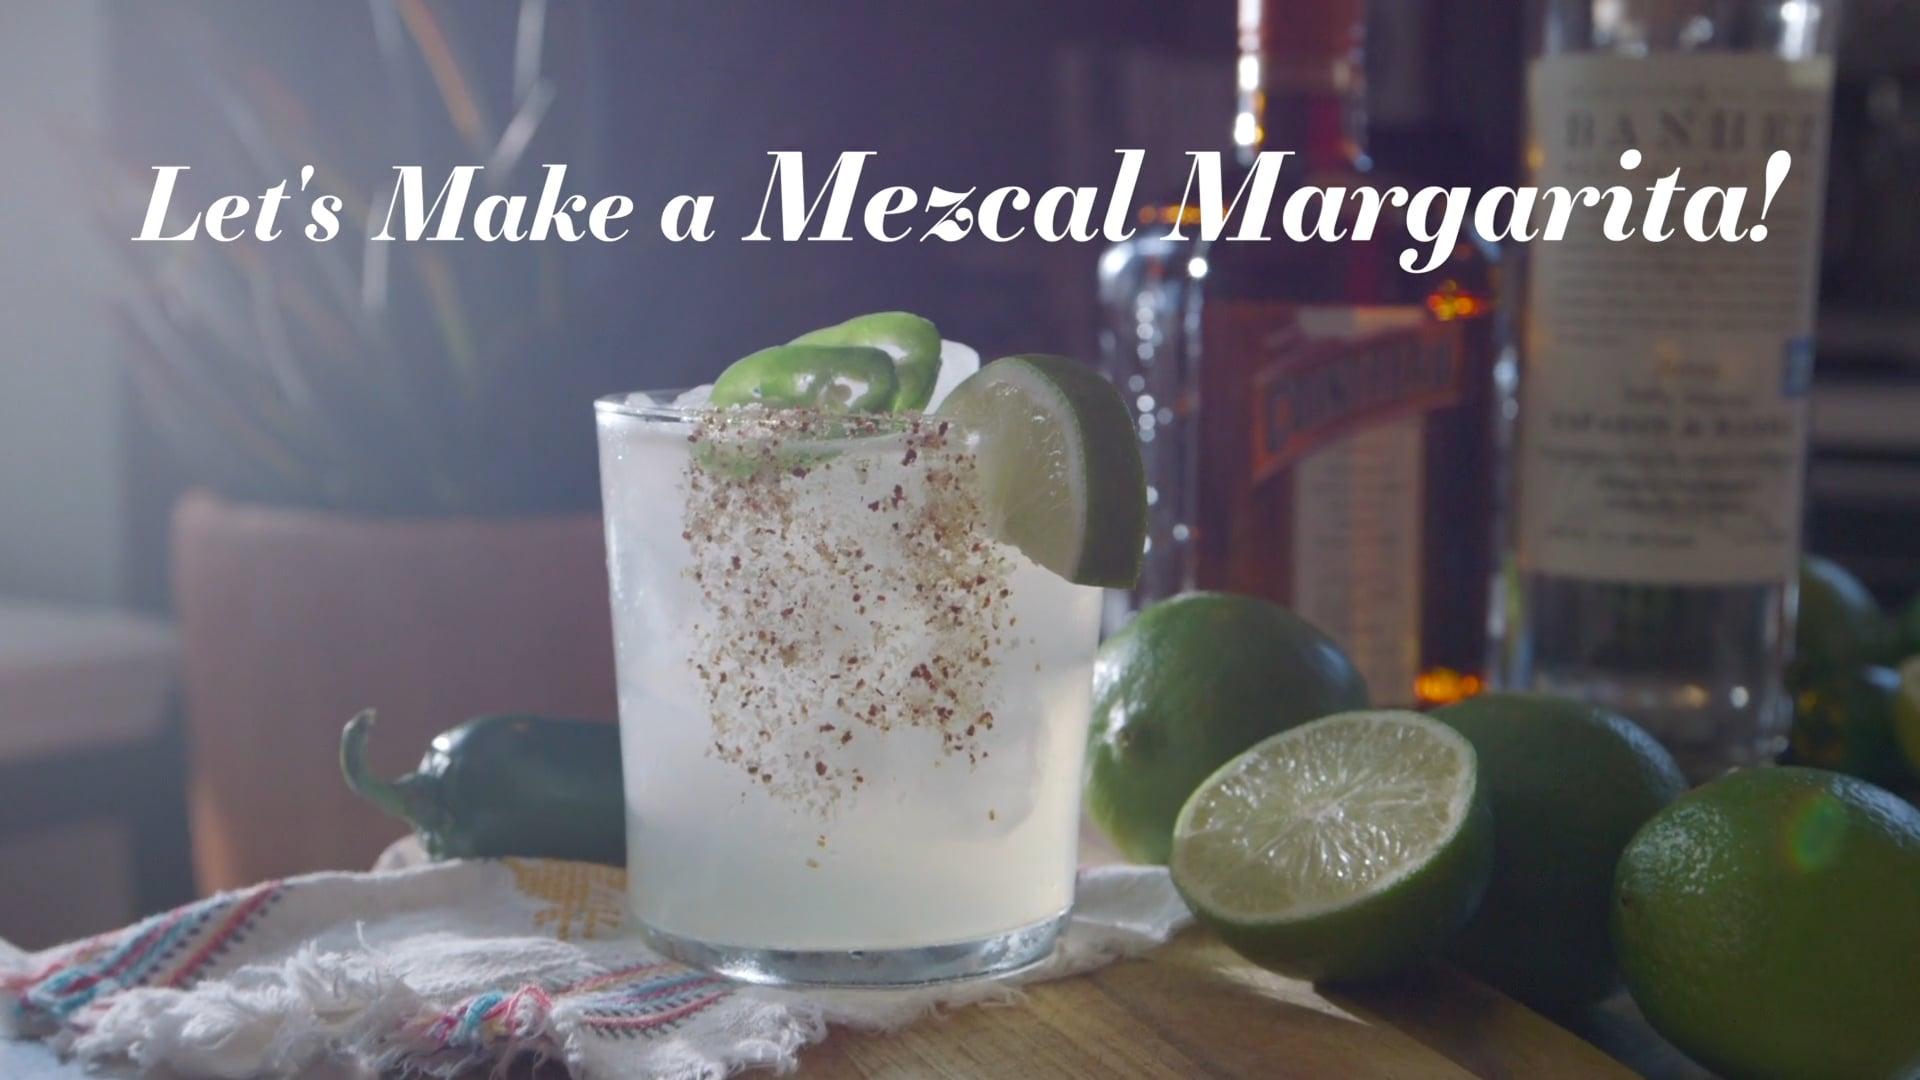 HOMESY X HILTON CARTER: Let's Make a Mezcal Margarita